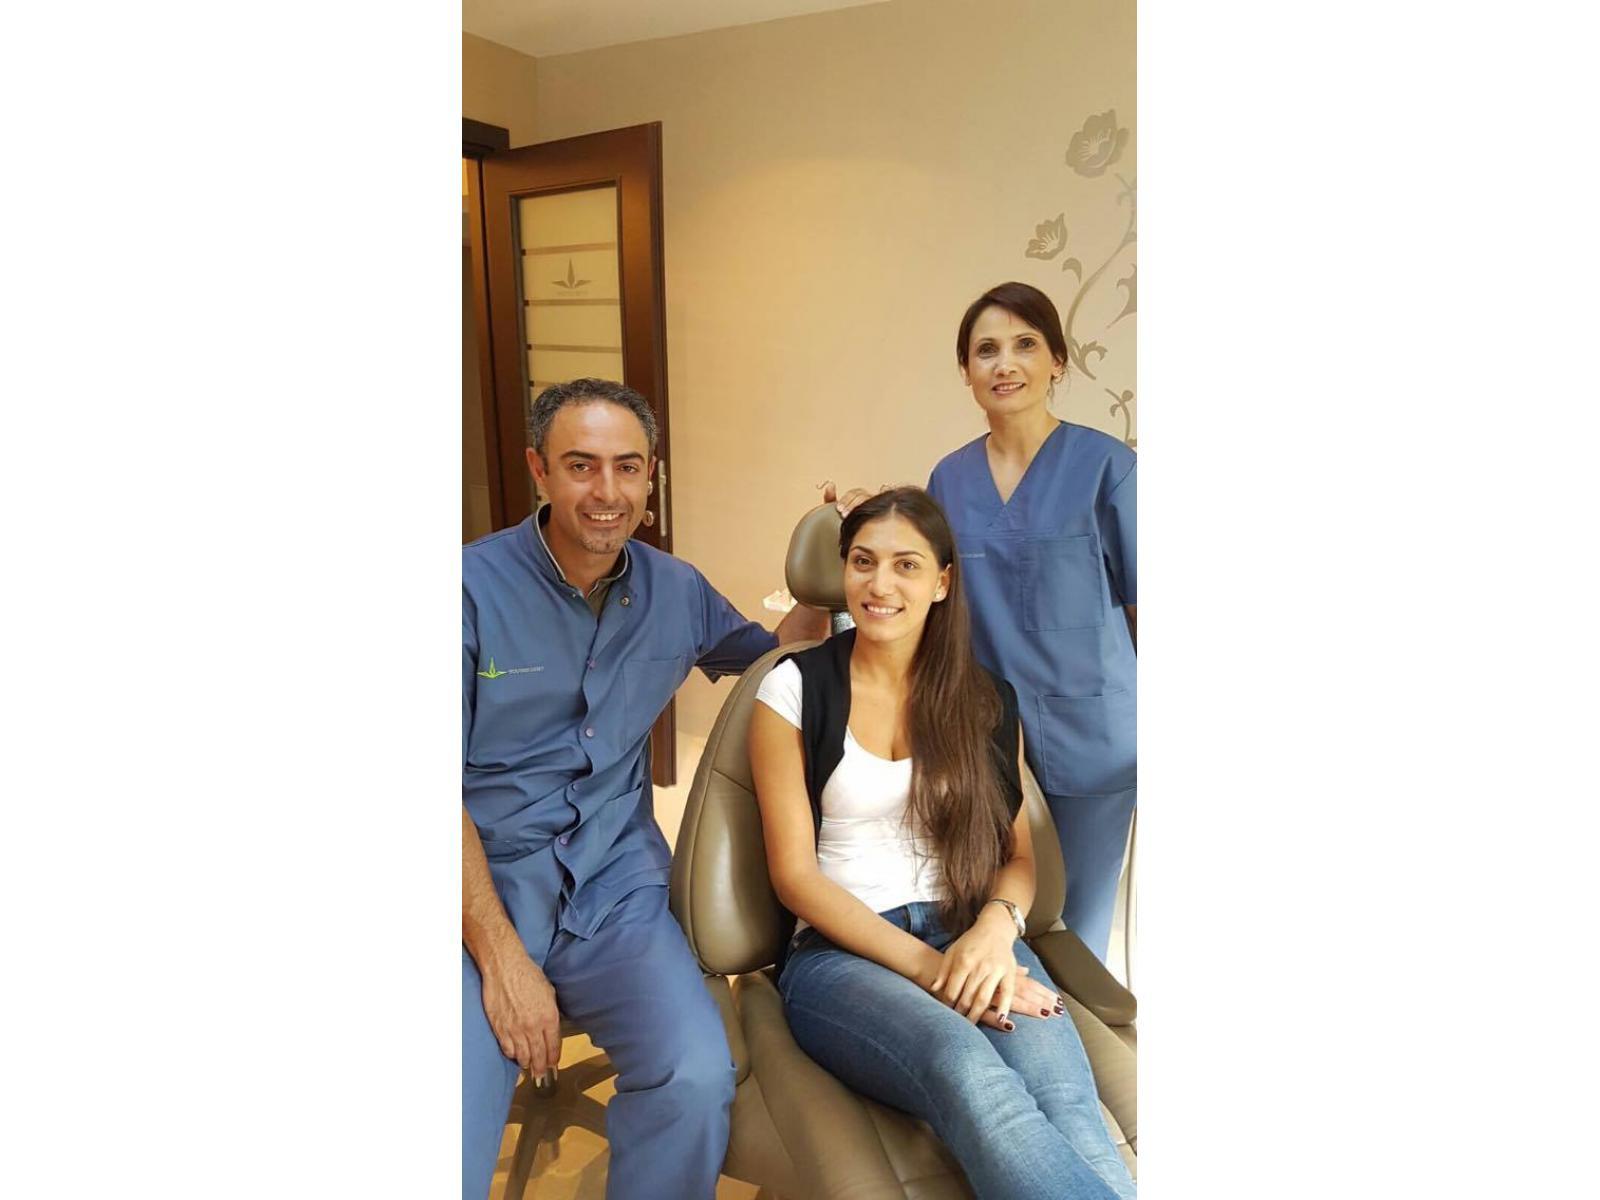 Clinica Stomatologica Younis Dent - 13446321_10206475197654573_1037816558_o.jpg